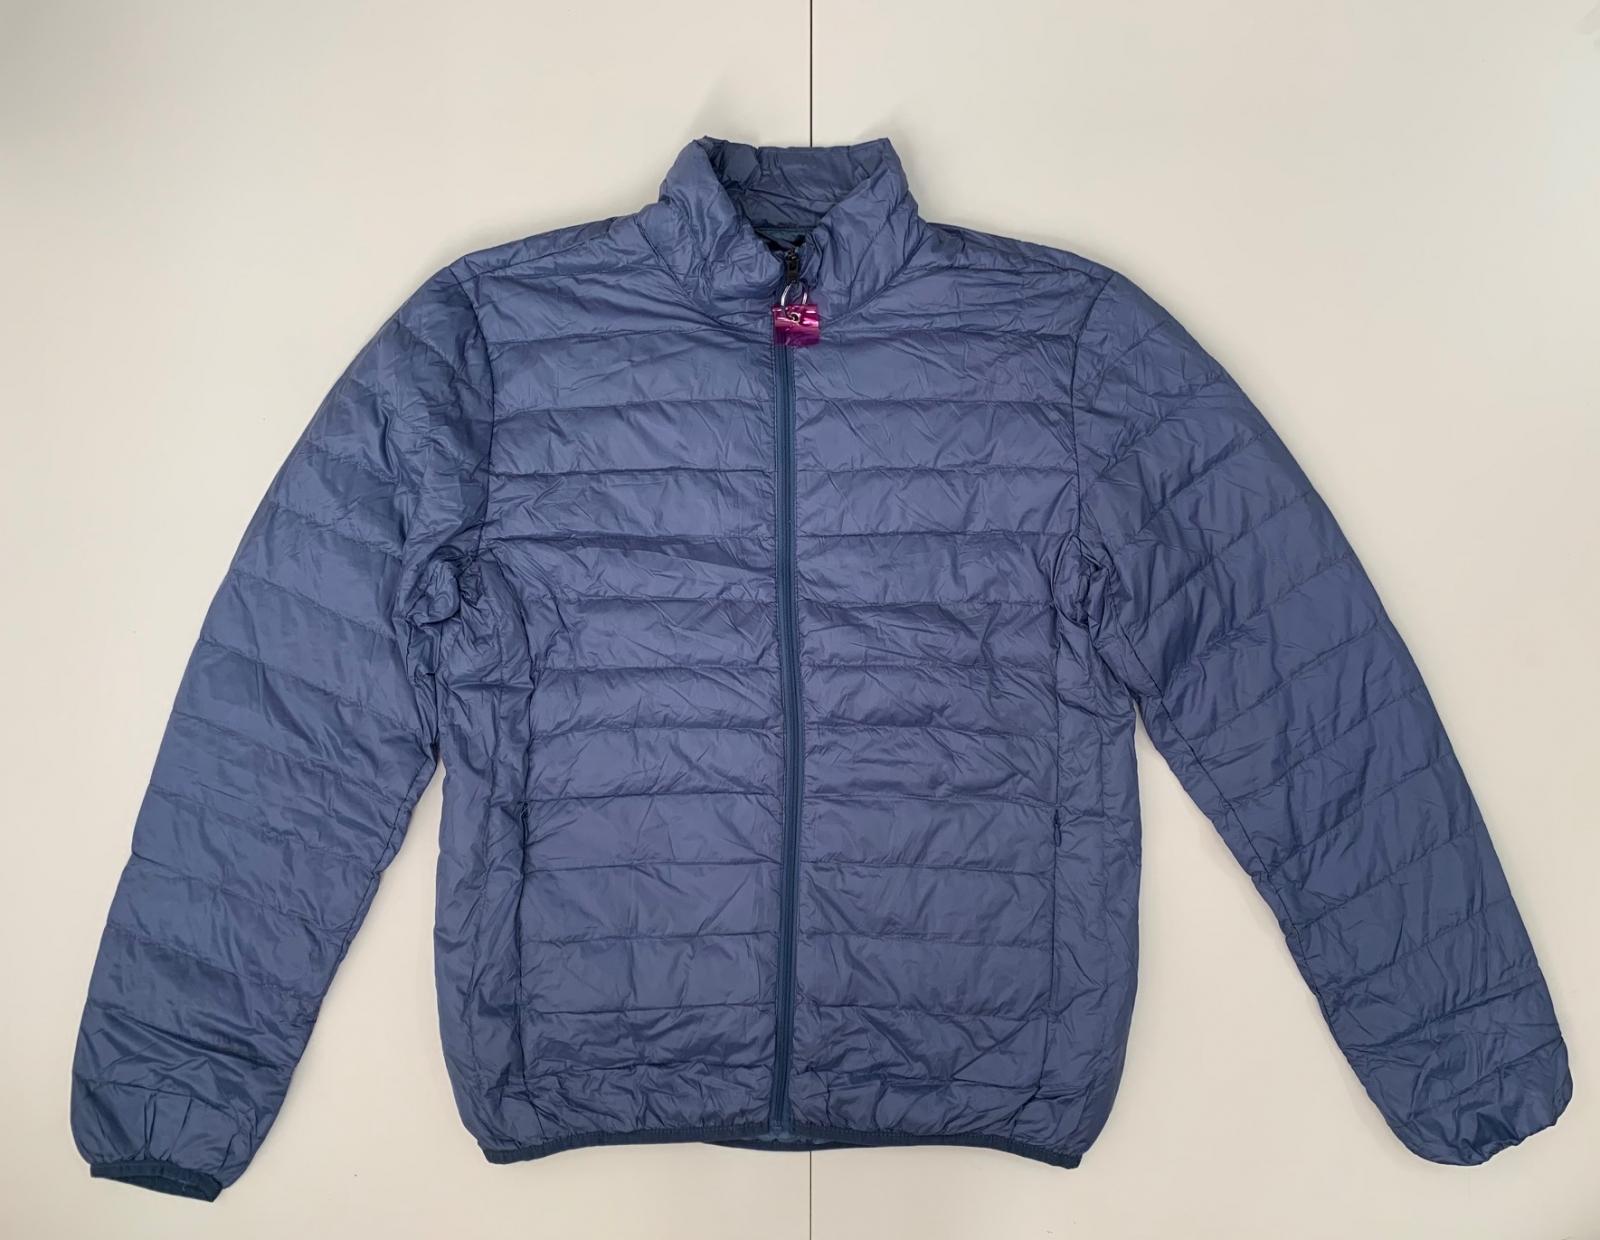 Трендовая мужская куртка от Seven lemon